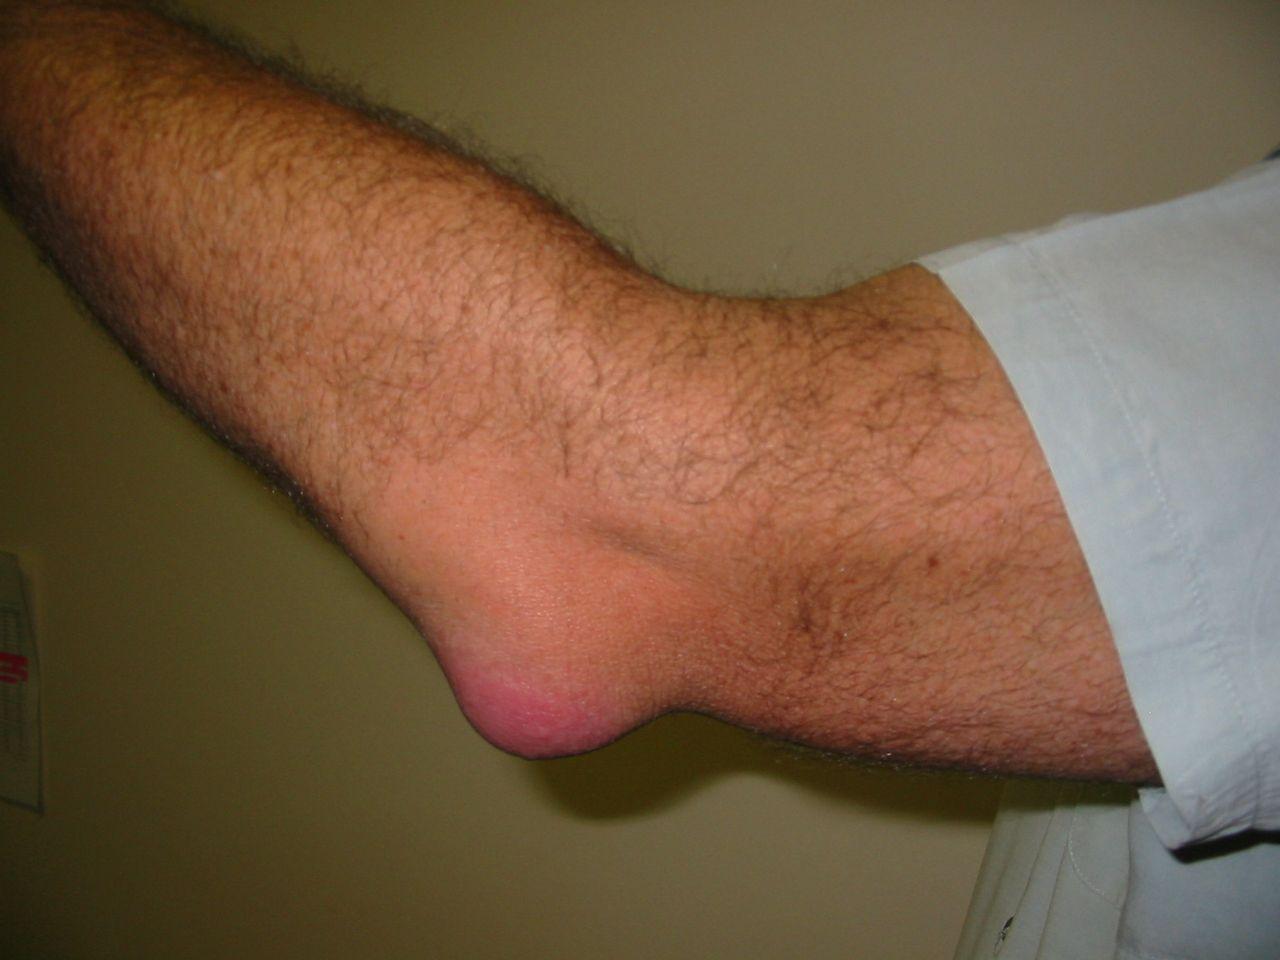 Könyökfájdalom gyakori okai - Dr. Zátrok Zsolt blog